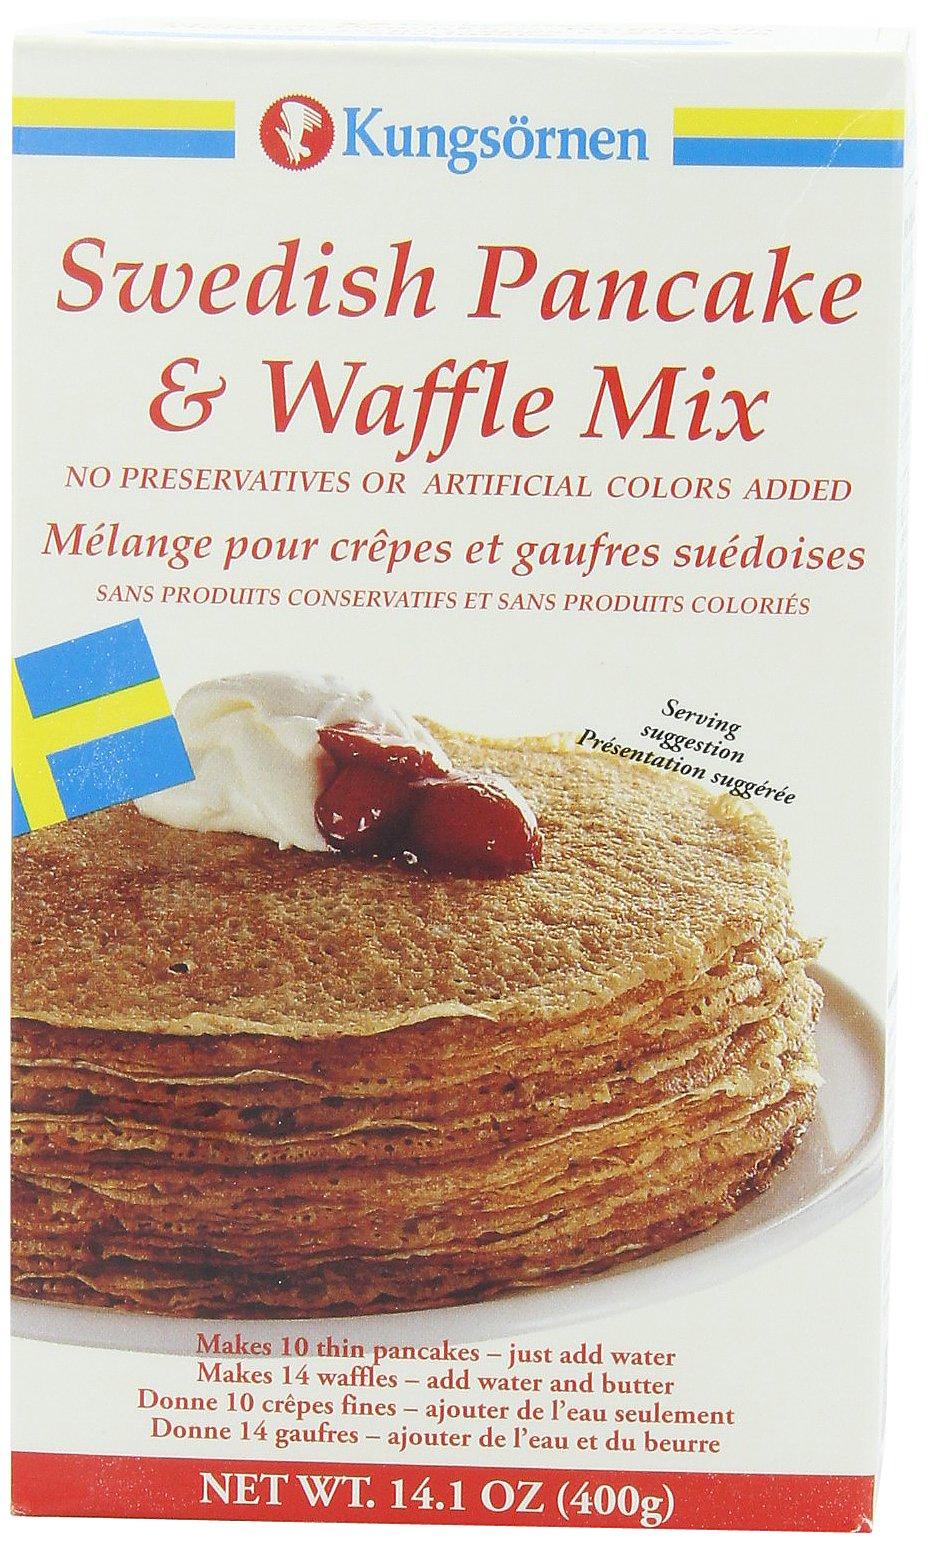 Kungsornen Swedish Pancake & Waffle Mix, 14.1-Ounce Boxes (Pack of 6)